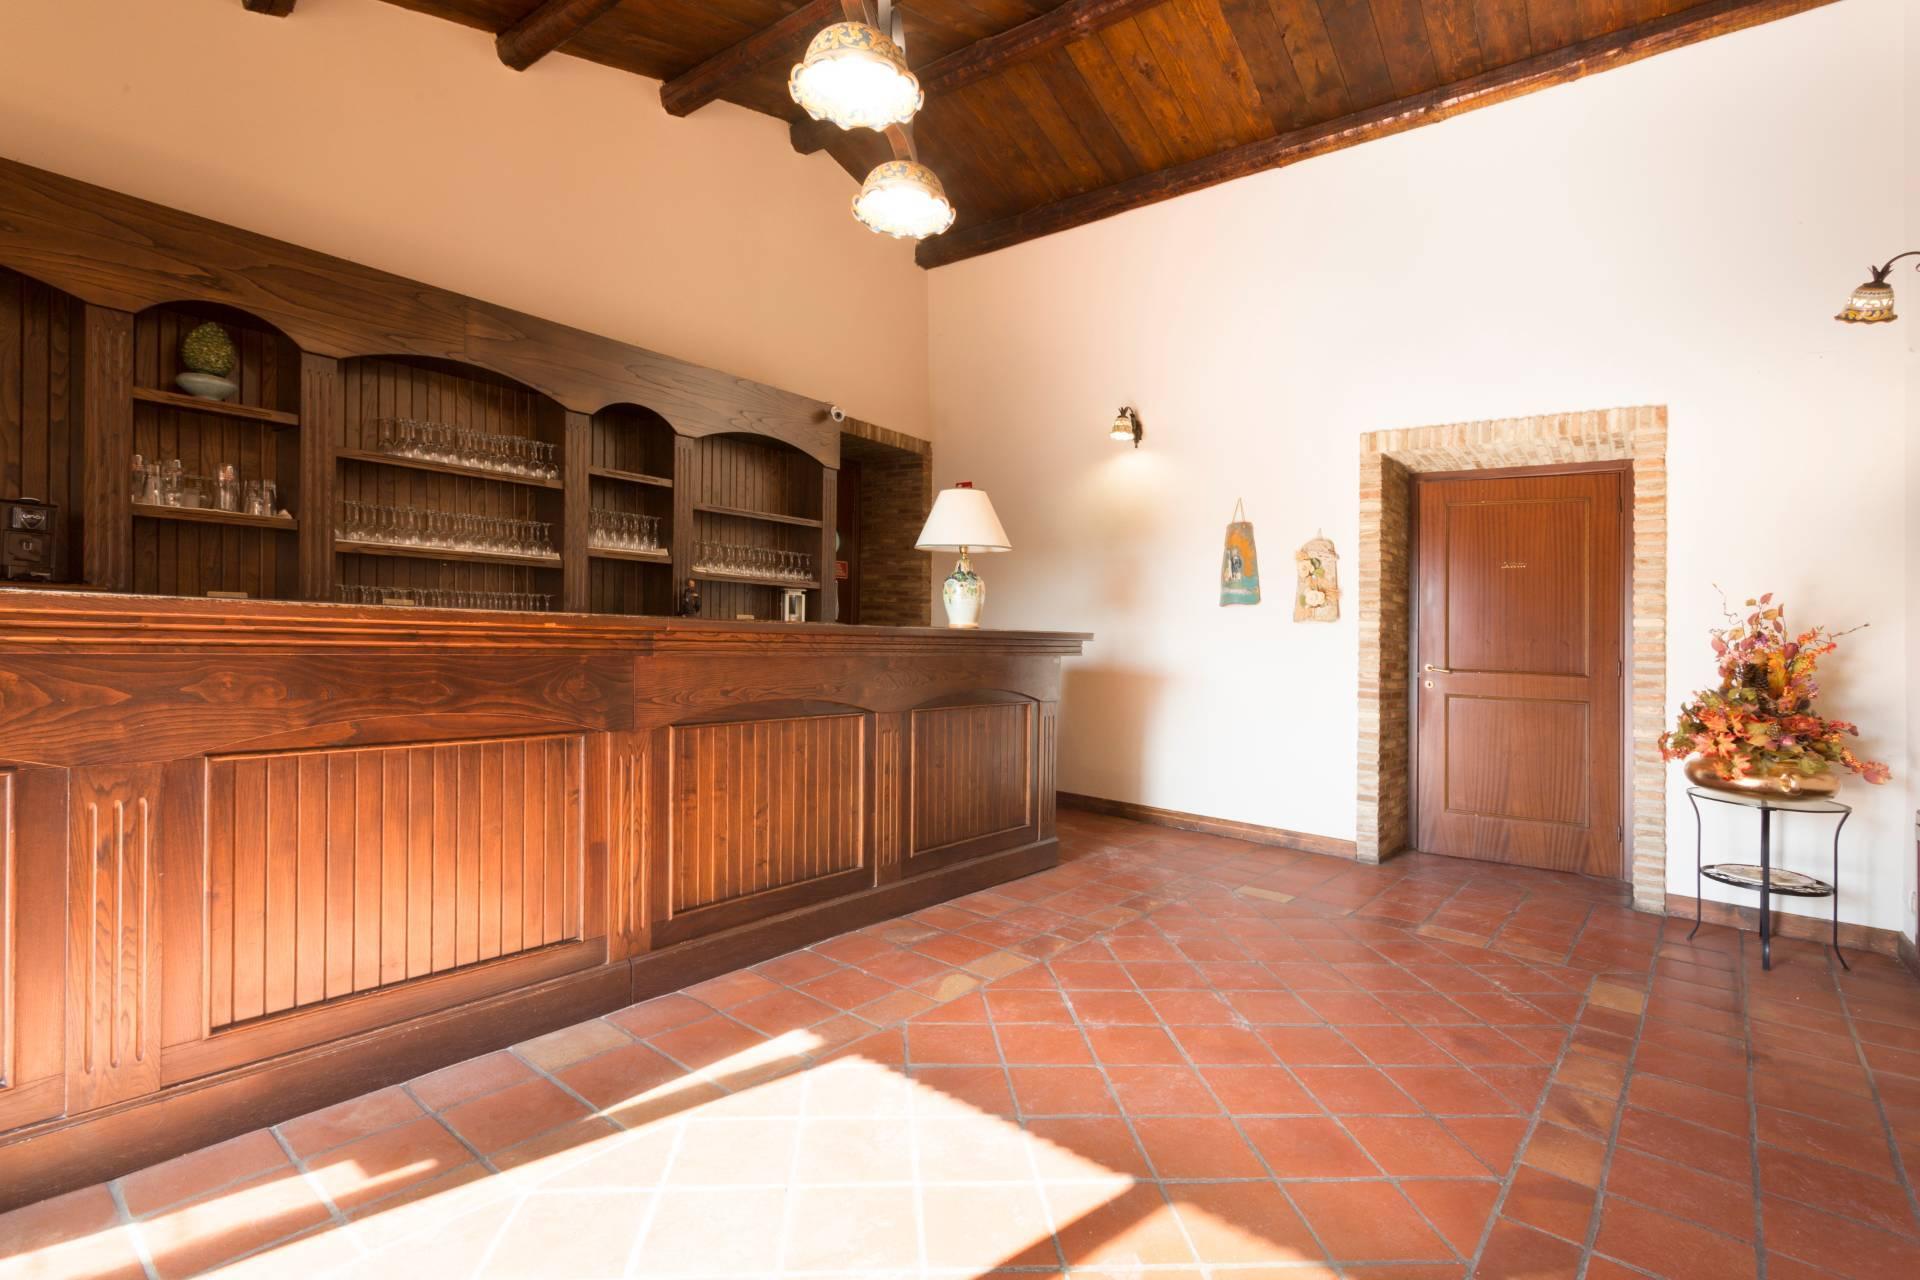 Villa in Vendita a Piazza Armerina: 5 locali, 550 mq - Foto 26